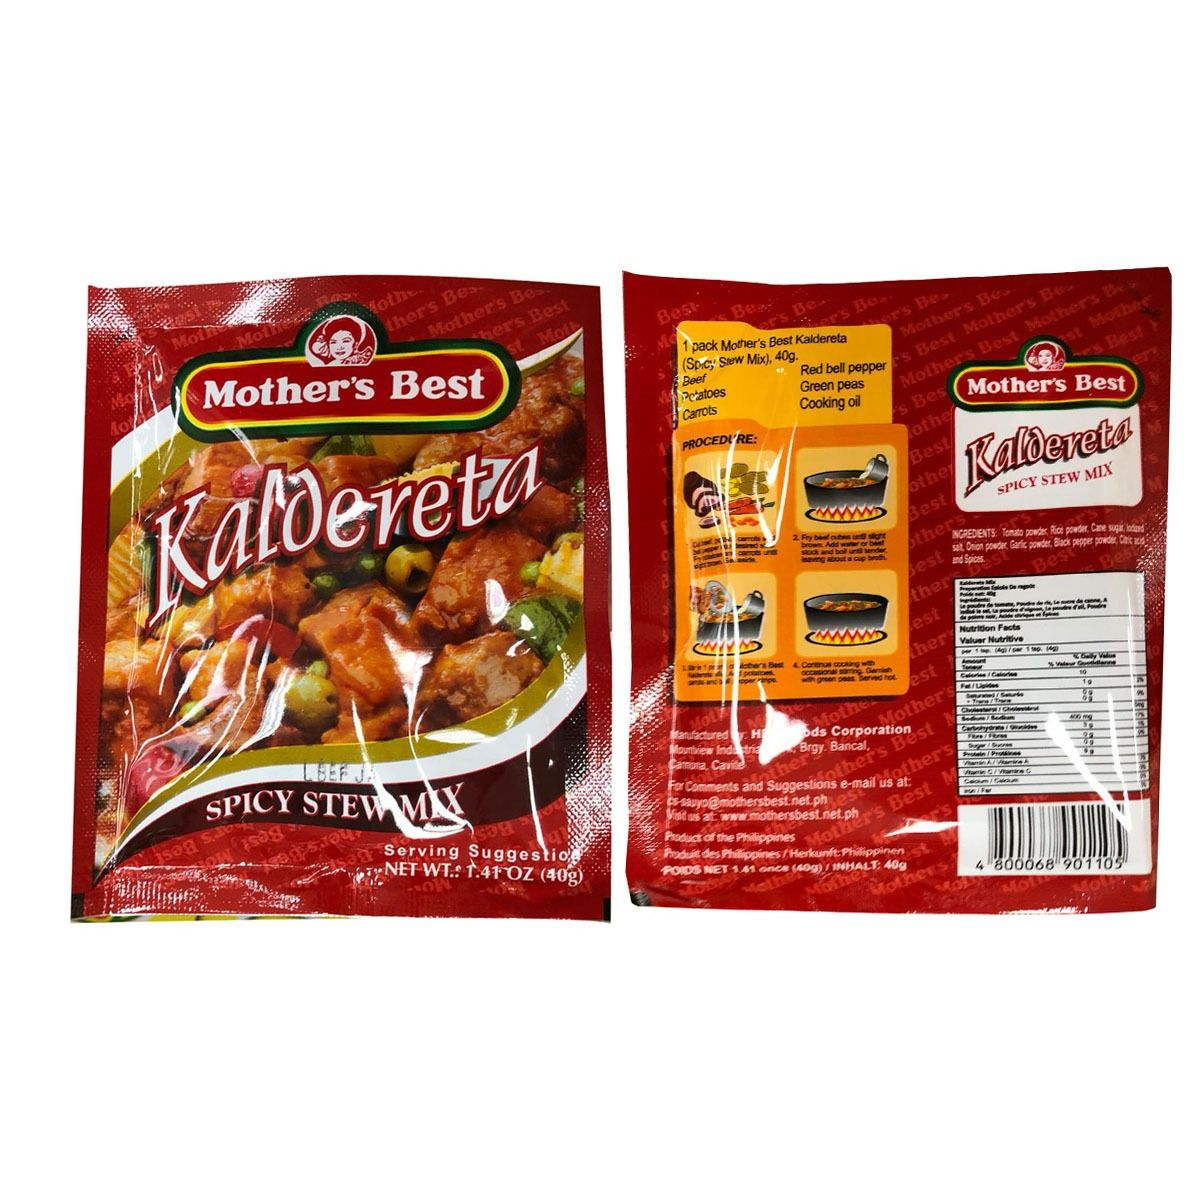 medium mothers best kaldreta spicy stew mix 141 oz OYGwRmnGsE